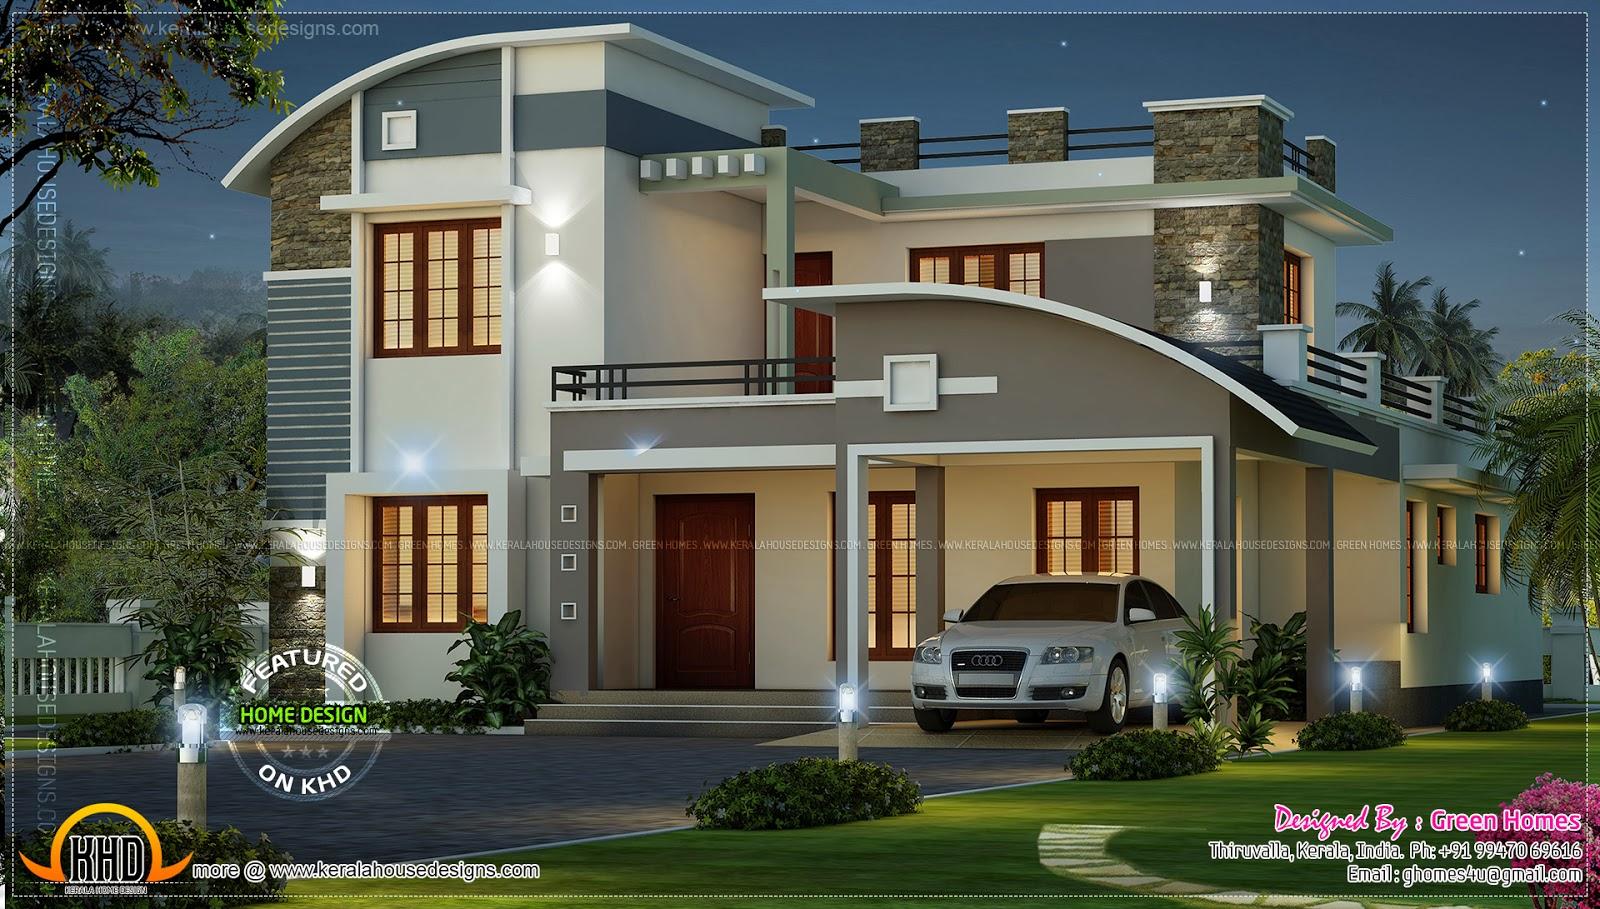 Modern beautiful home - Kerala home design and floor plans on Beautiful Home Decor  id=13511